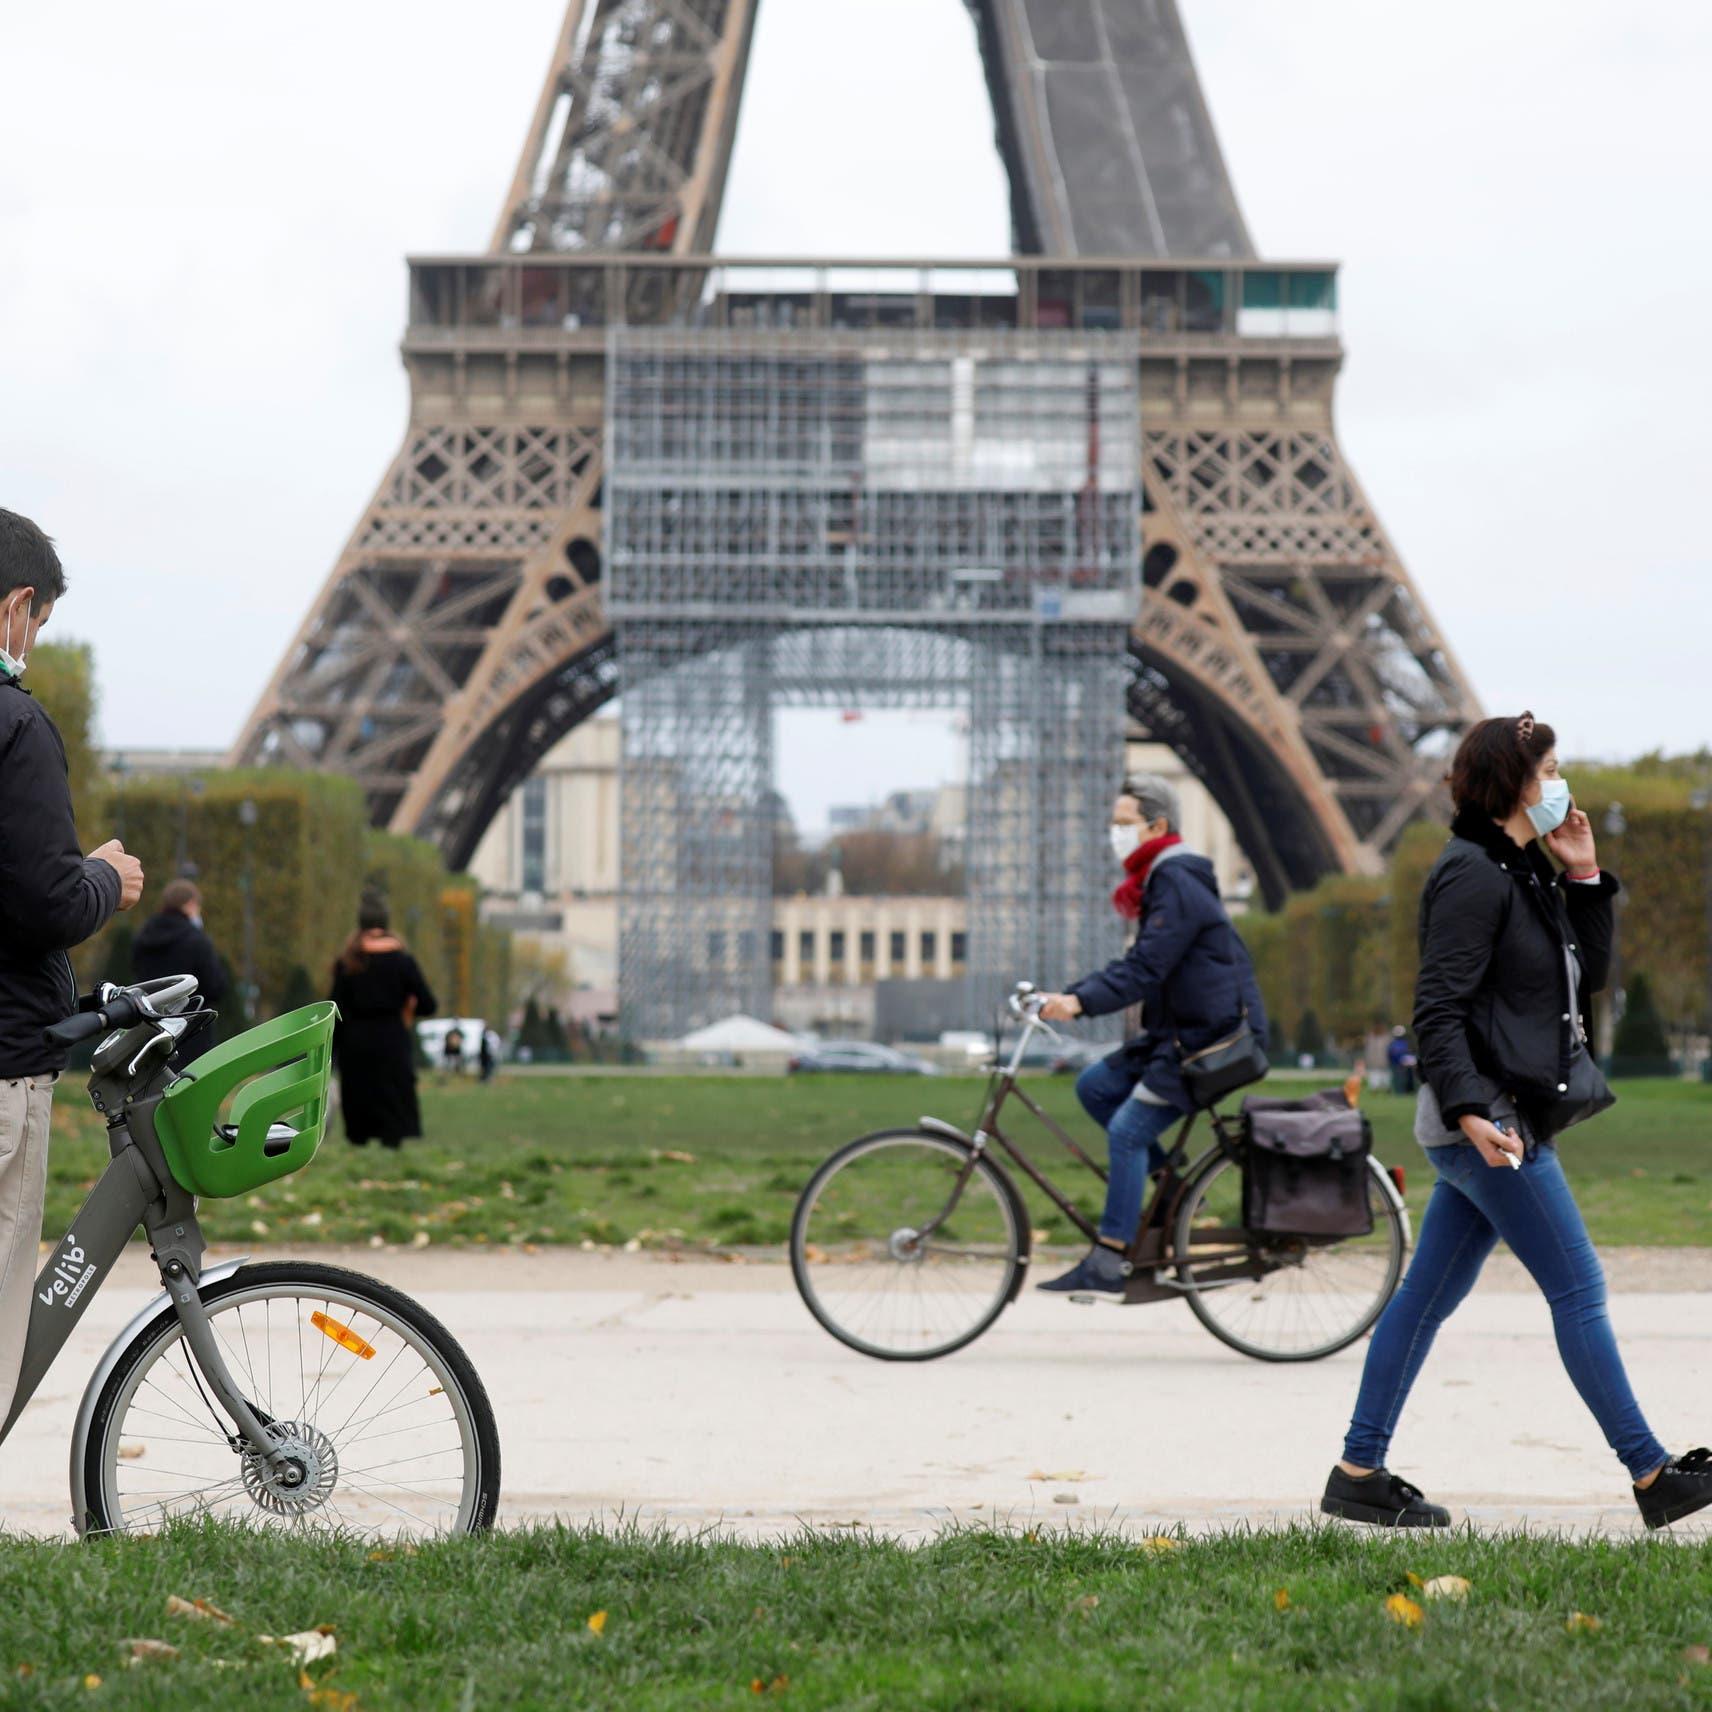 Masks no longer mandatory outdoors in France from Thursday: PM